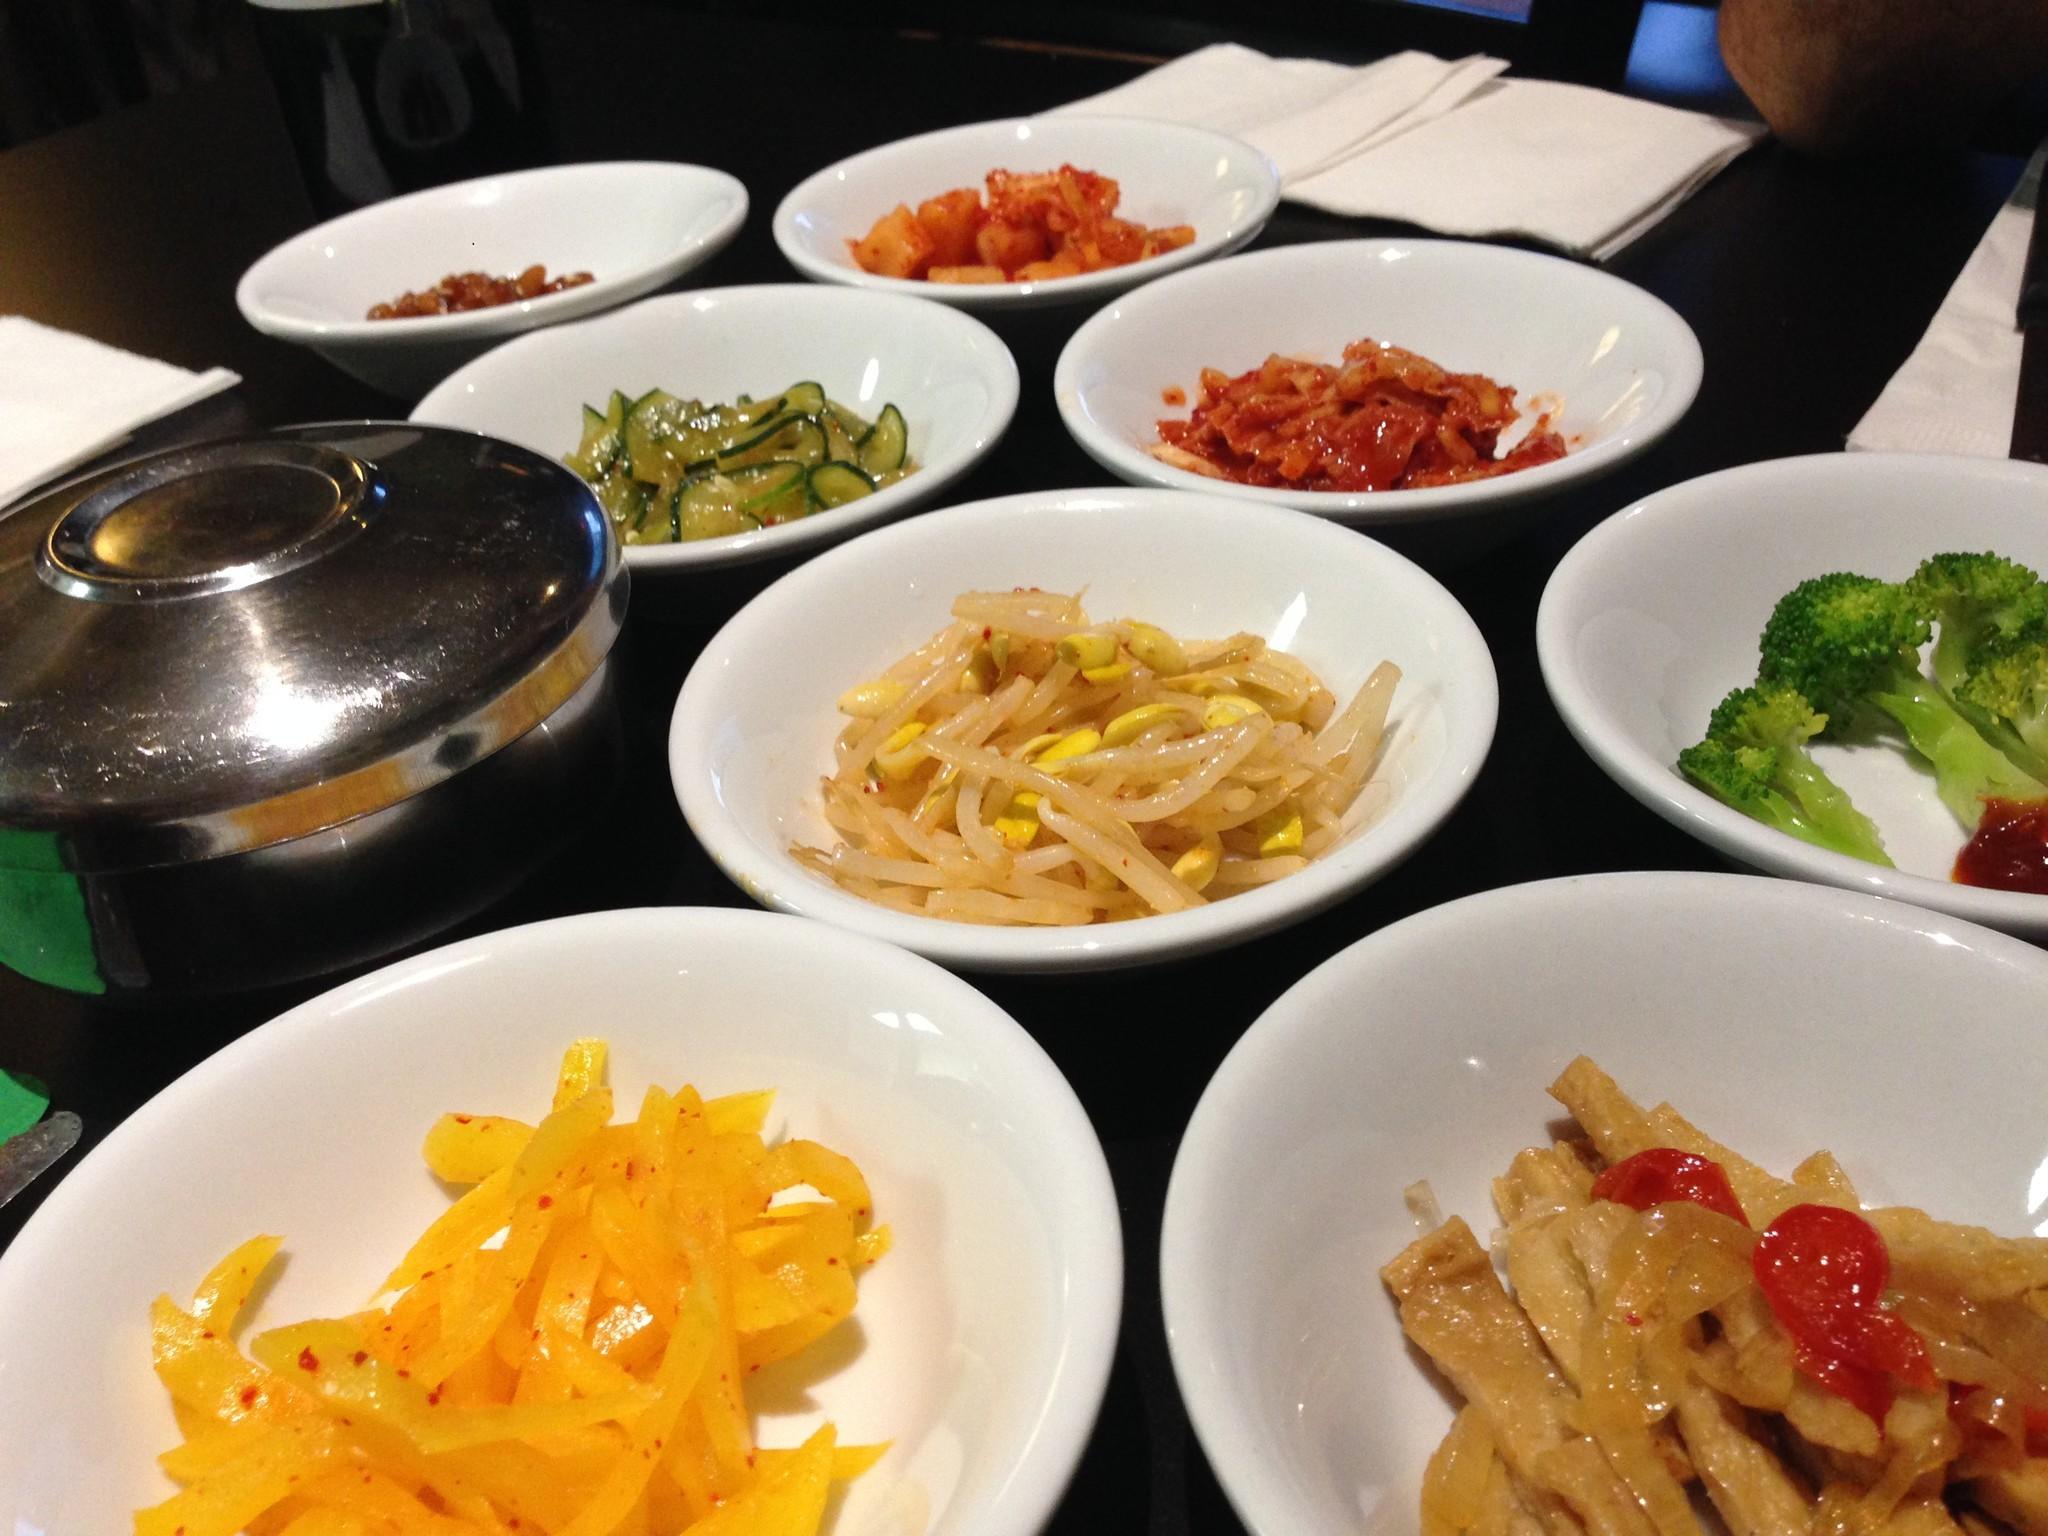 Top Broward restaurants - Chimi and Kimchi Grill